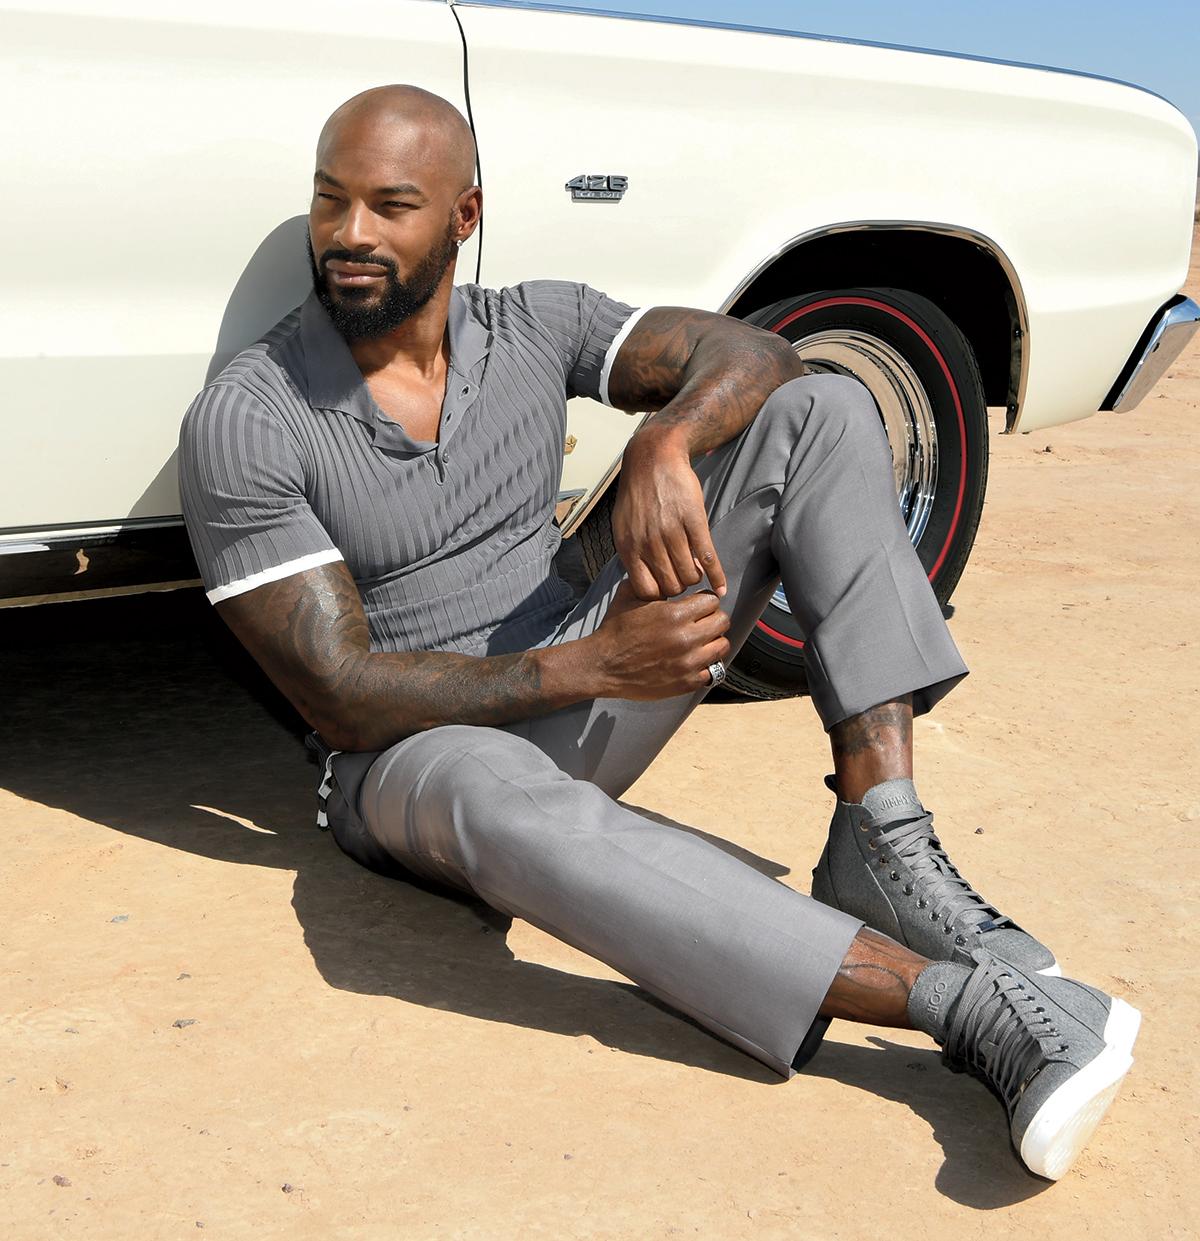 Tyson Mr. Grey